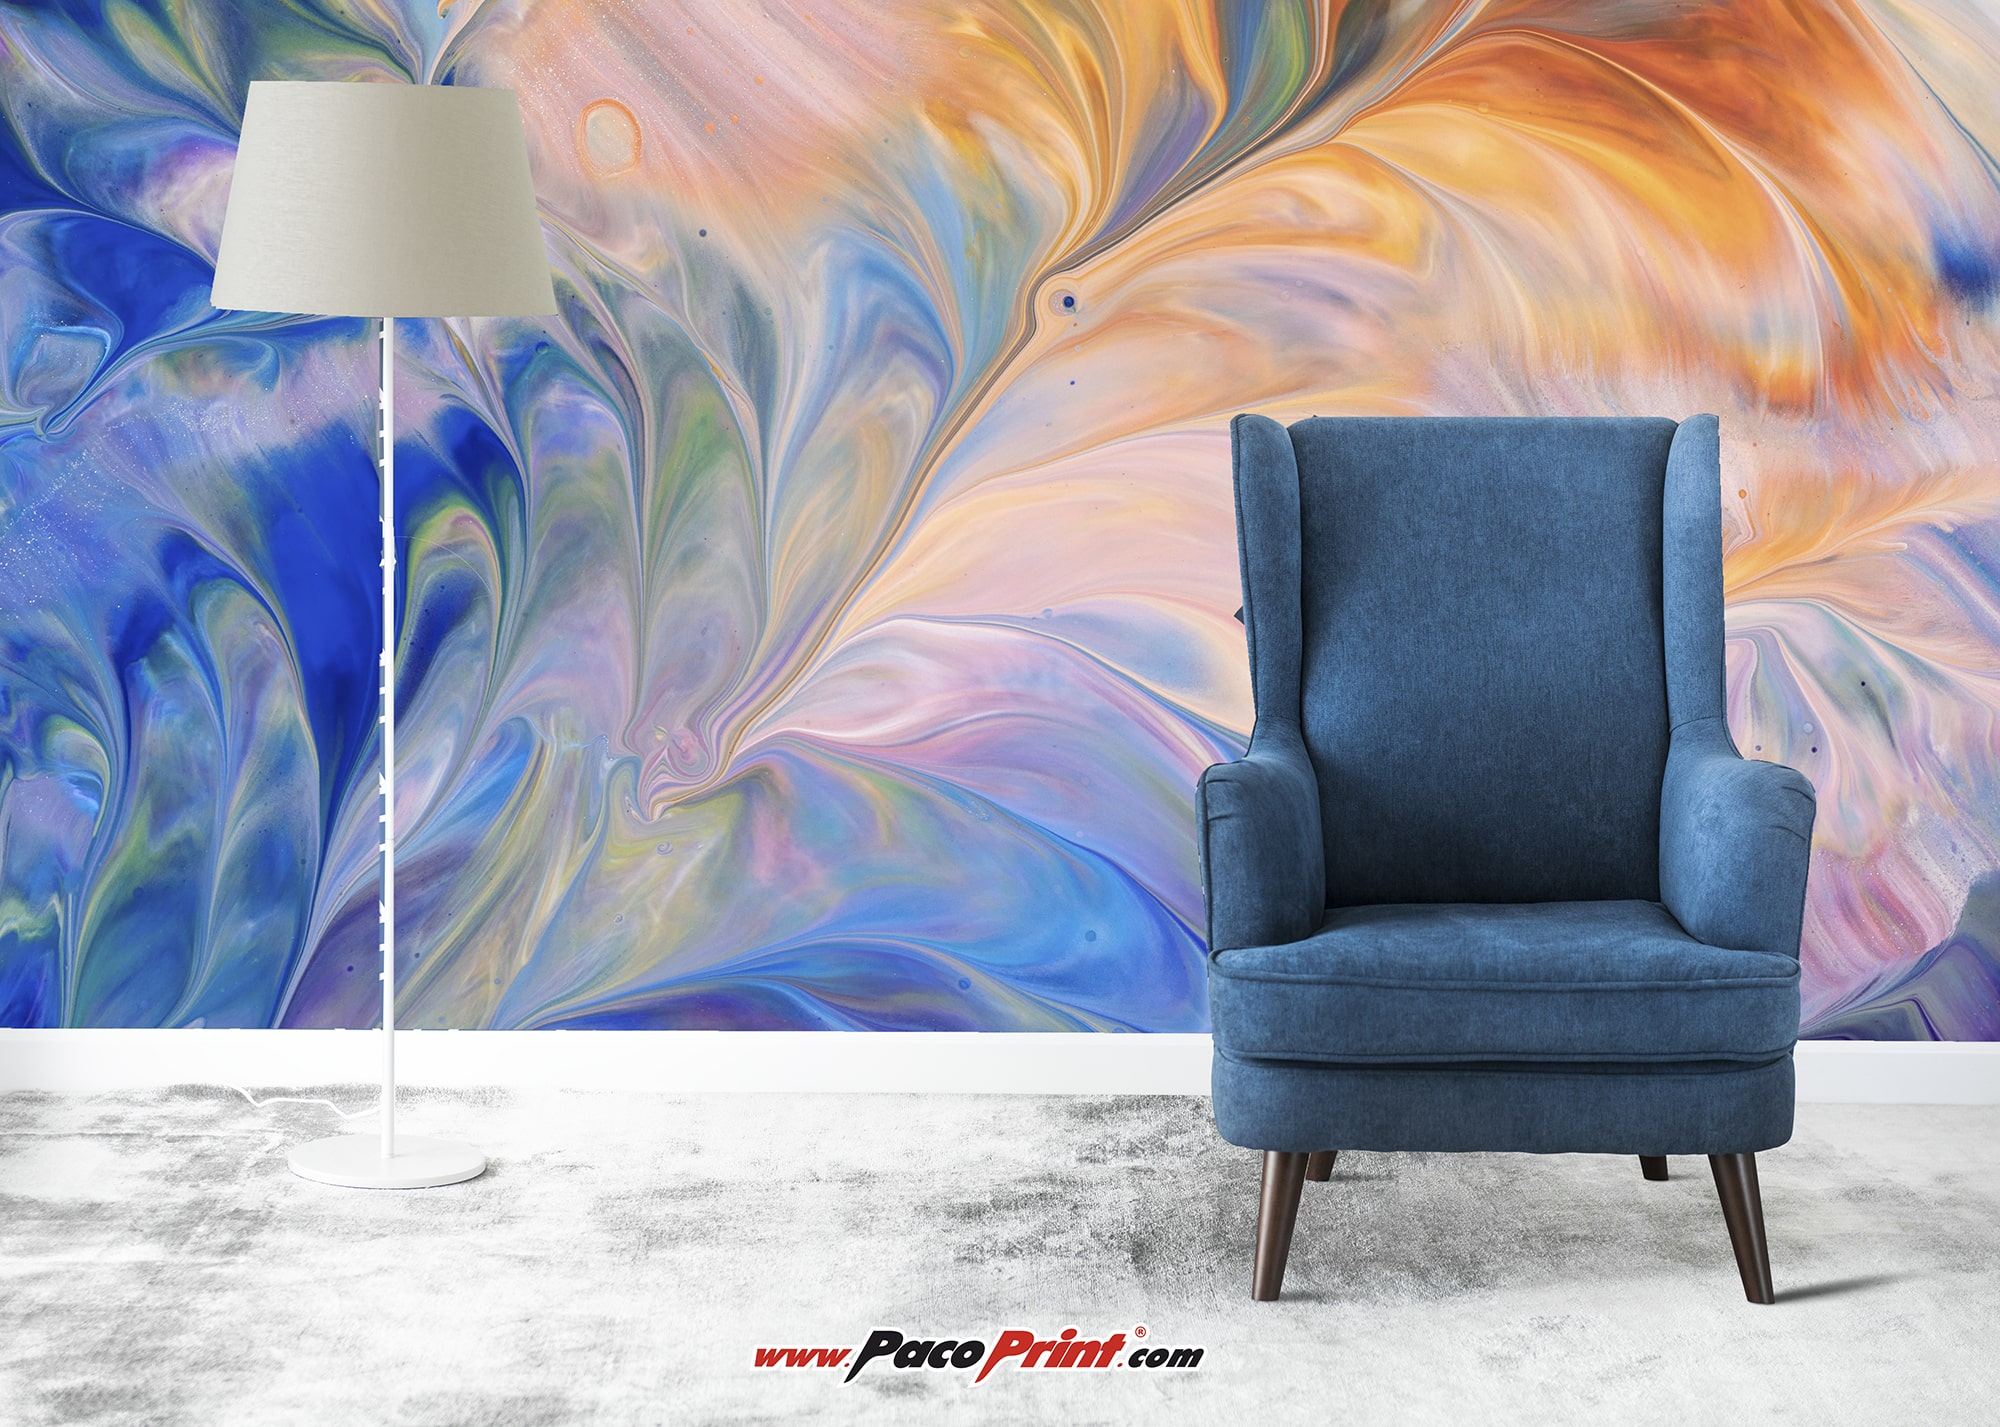 Impresión digital de textil para decorar tu casa.